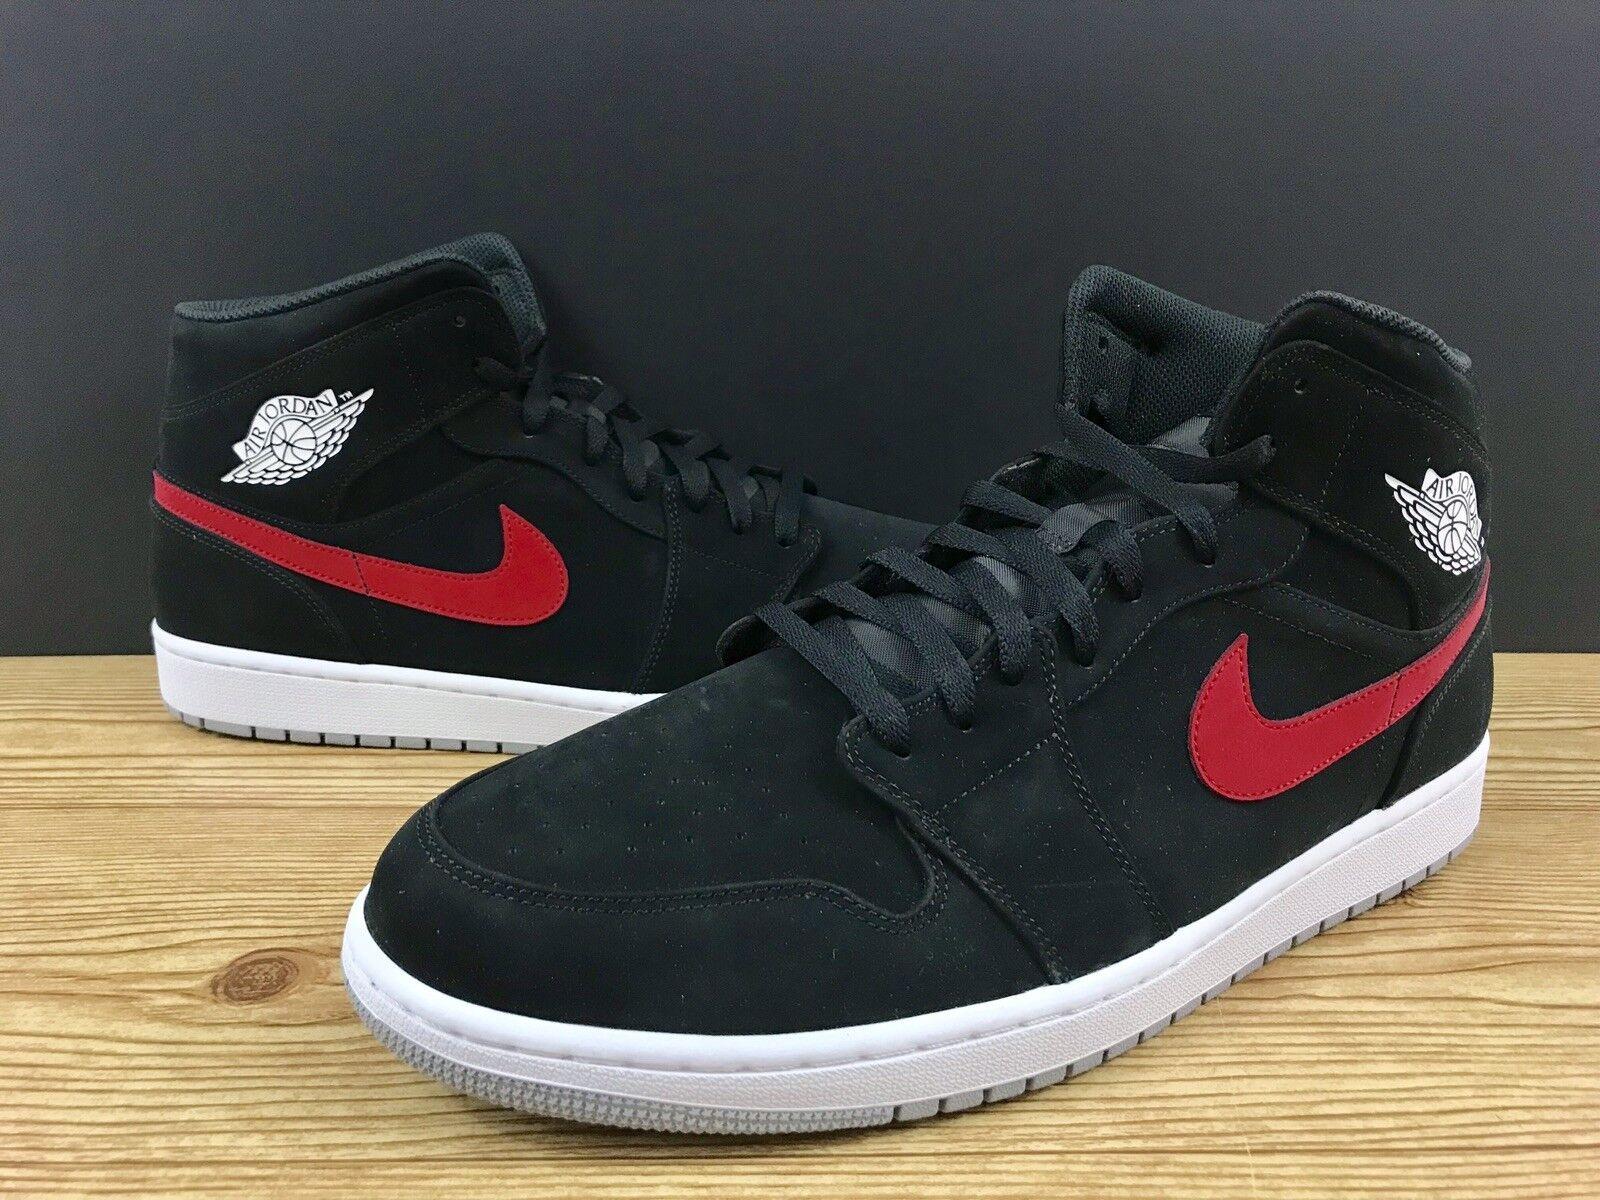 5e40f5913ec8 Nike Air Jordan 1 Mid Mid Mid Mens Sz 10 Shoes Black University Red Blue  554724